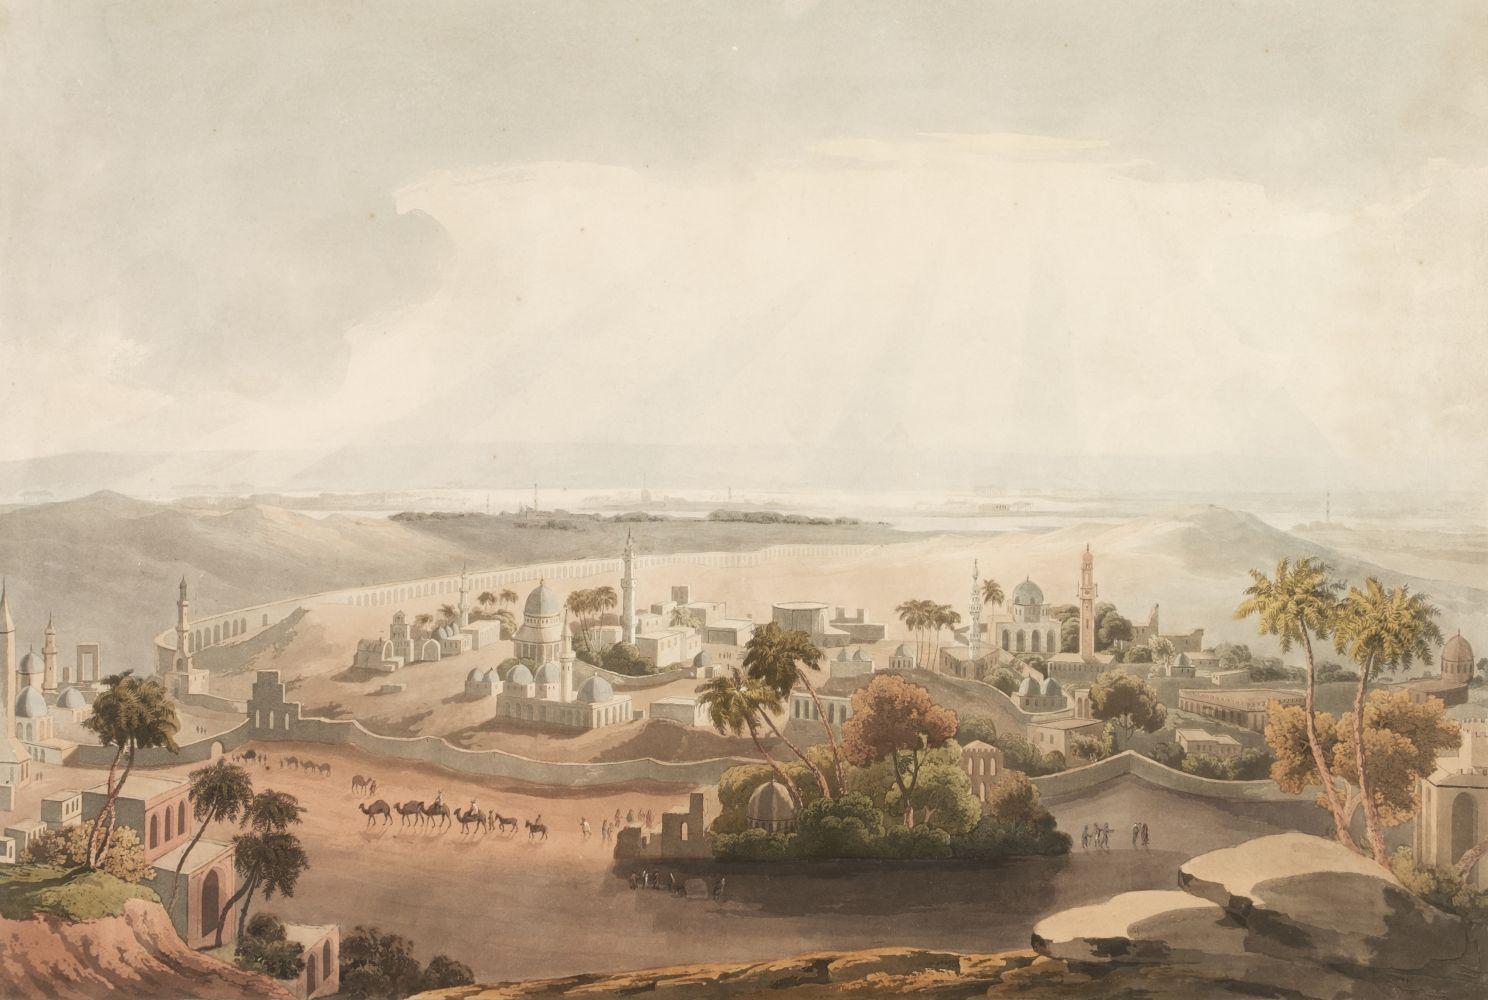 * Salt (Henry, 1780-1827) The Pyramids at Cairo, 1809